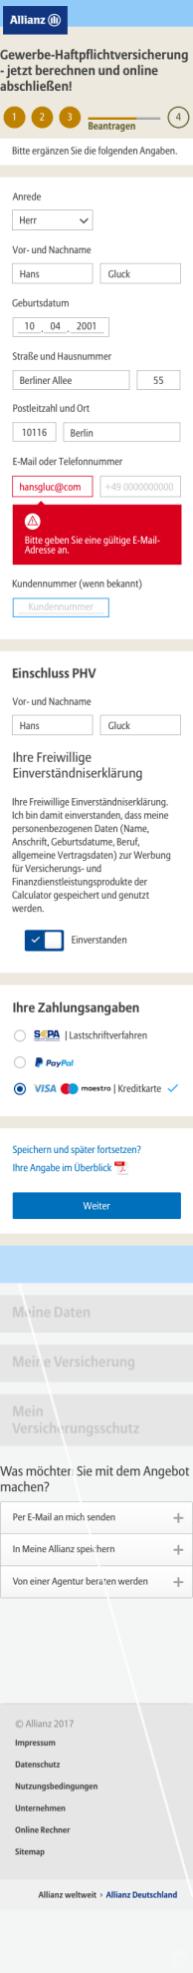 Allianz) 2 Clear x1